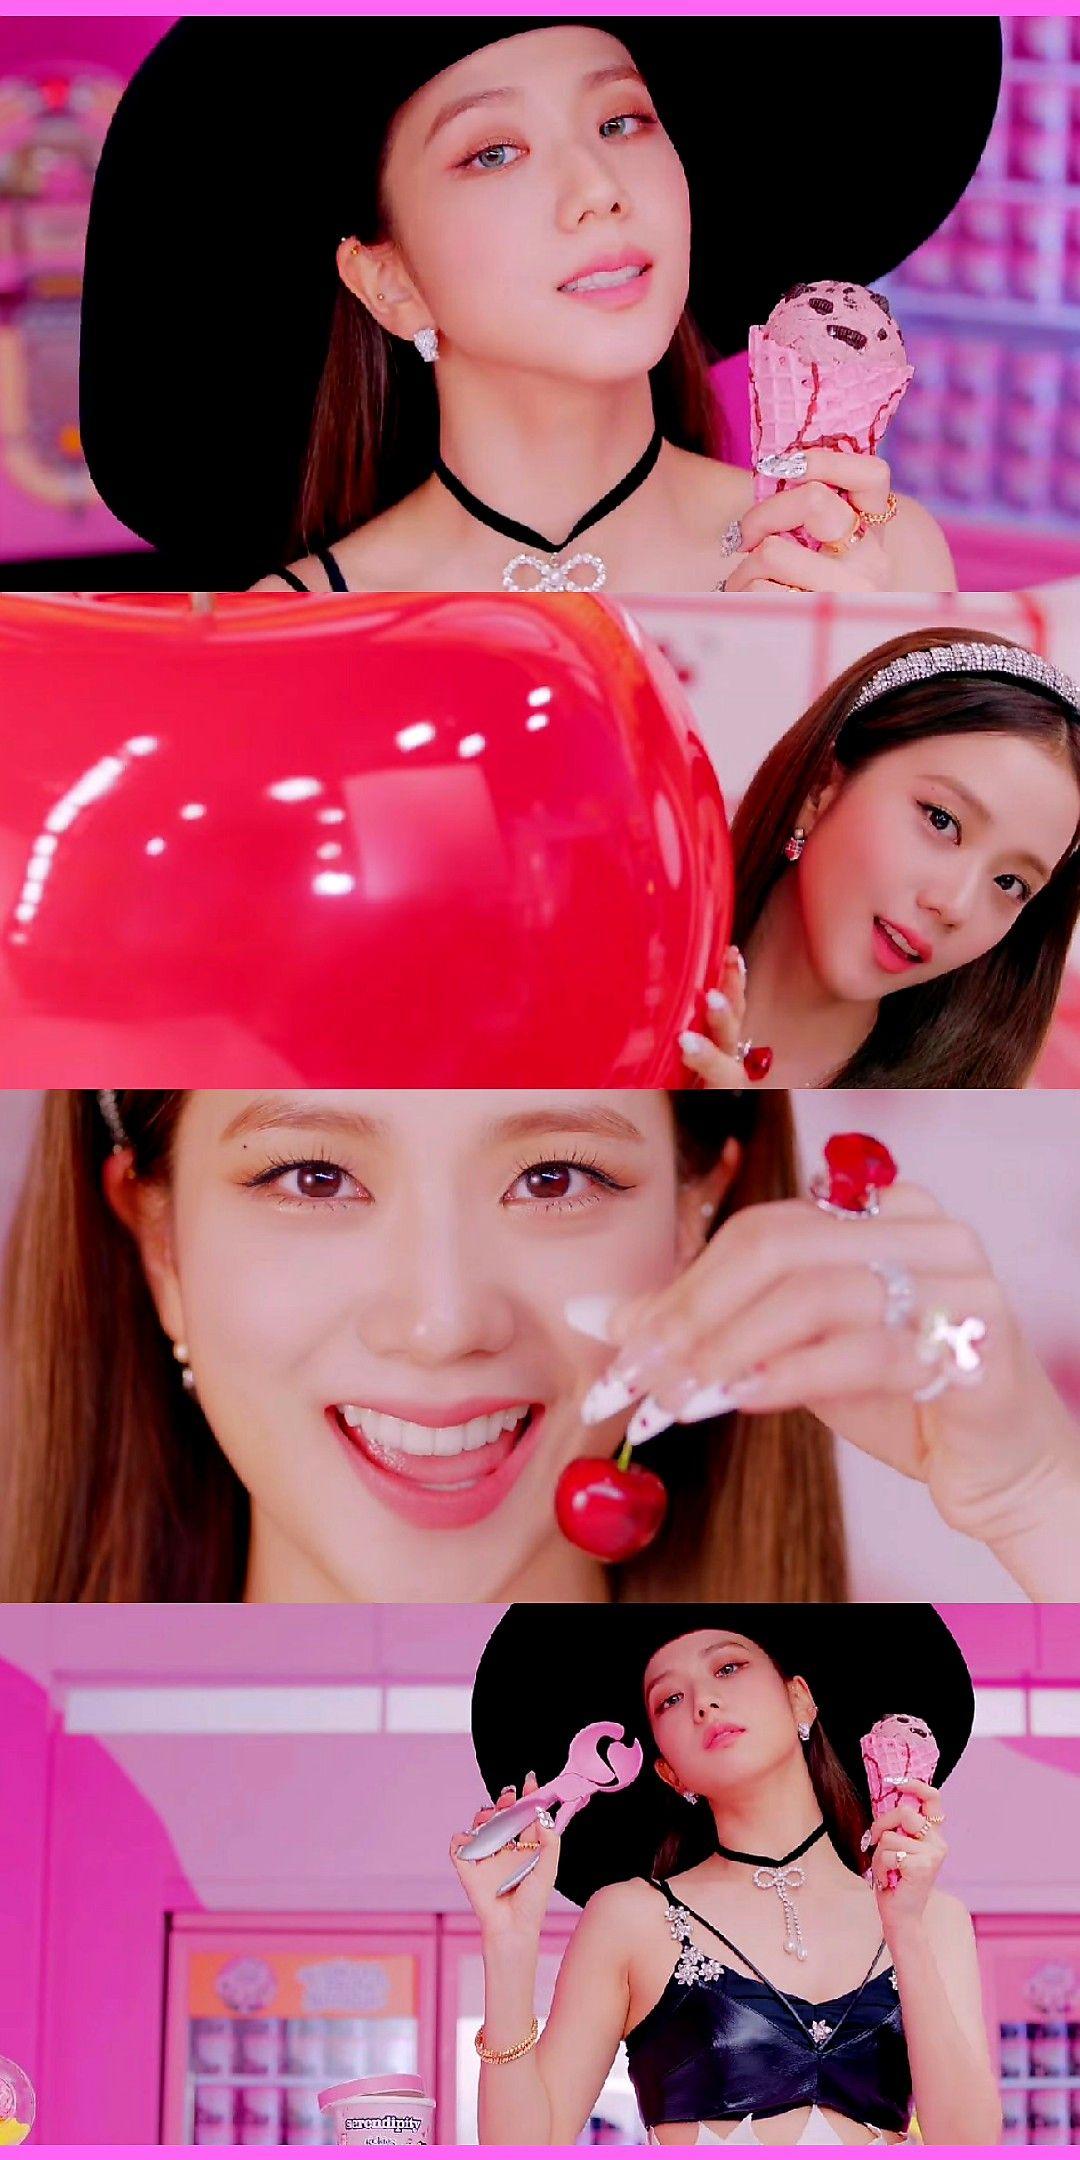 Blackpink Jisoo Ice Cream Lockscreen Wallpaper em 2020 ...